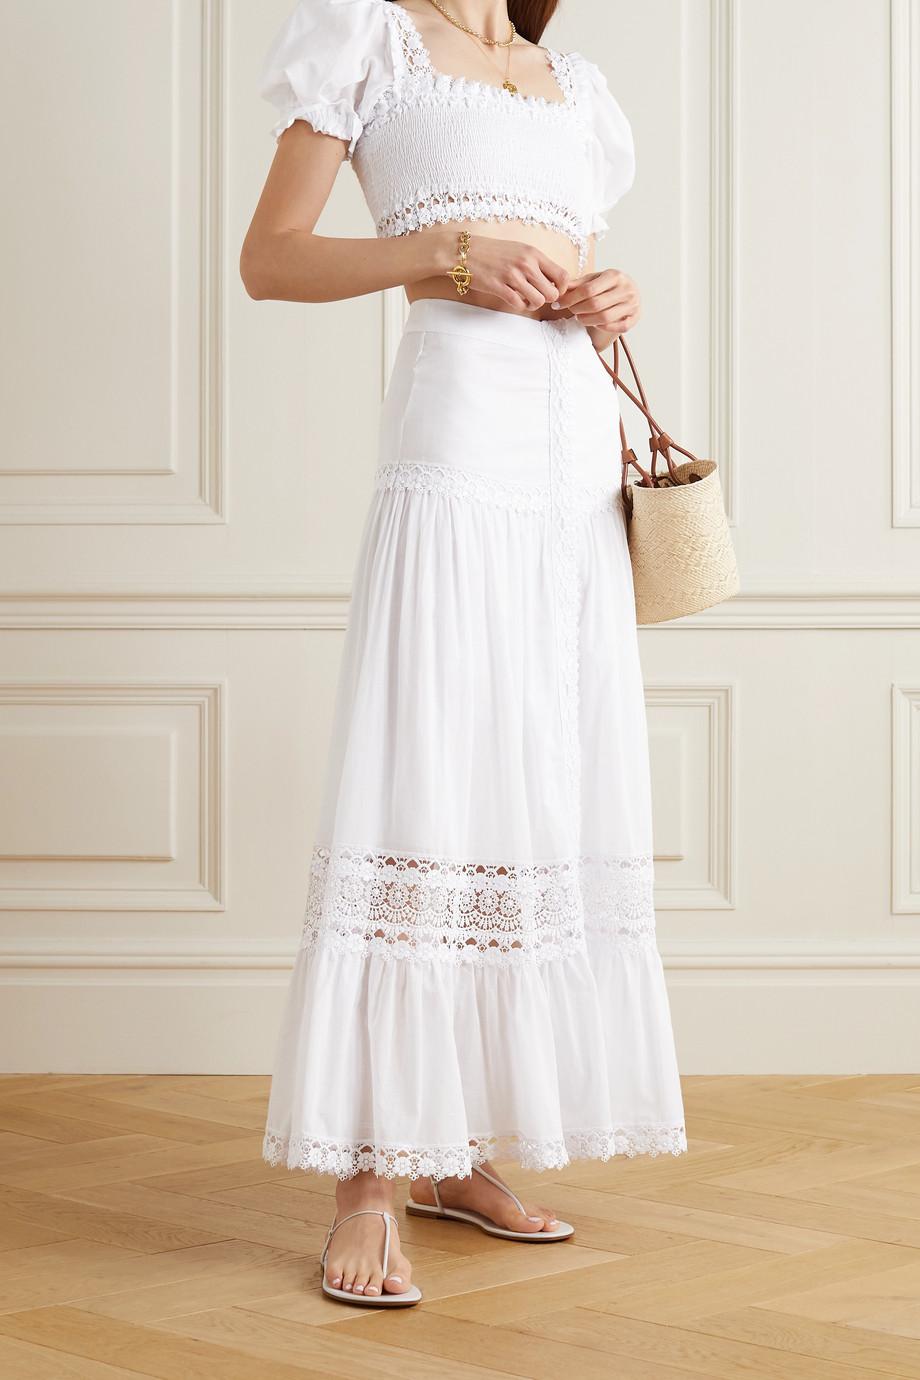 Charo Ruiz Ann guipure lace-trimmed cotton-blend voile skirt